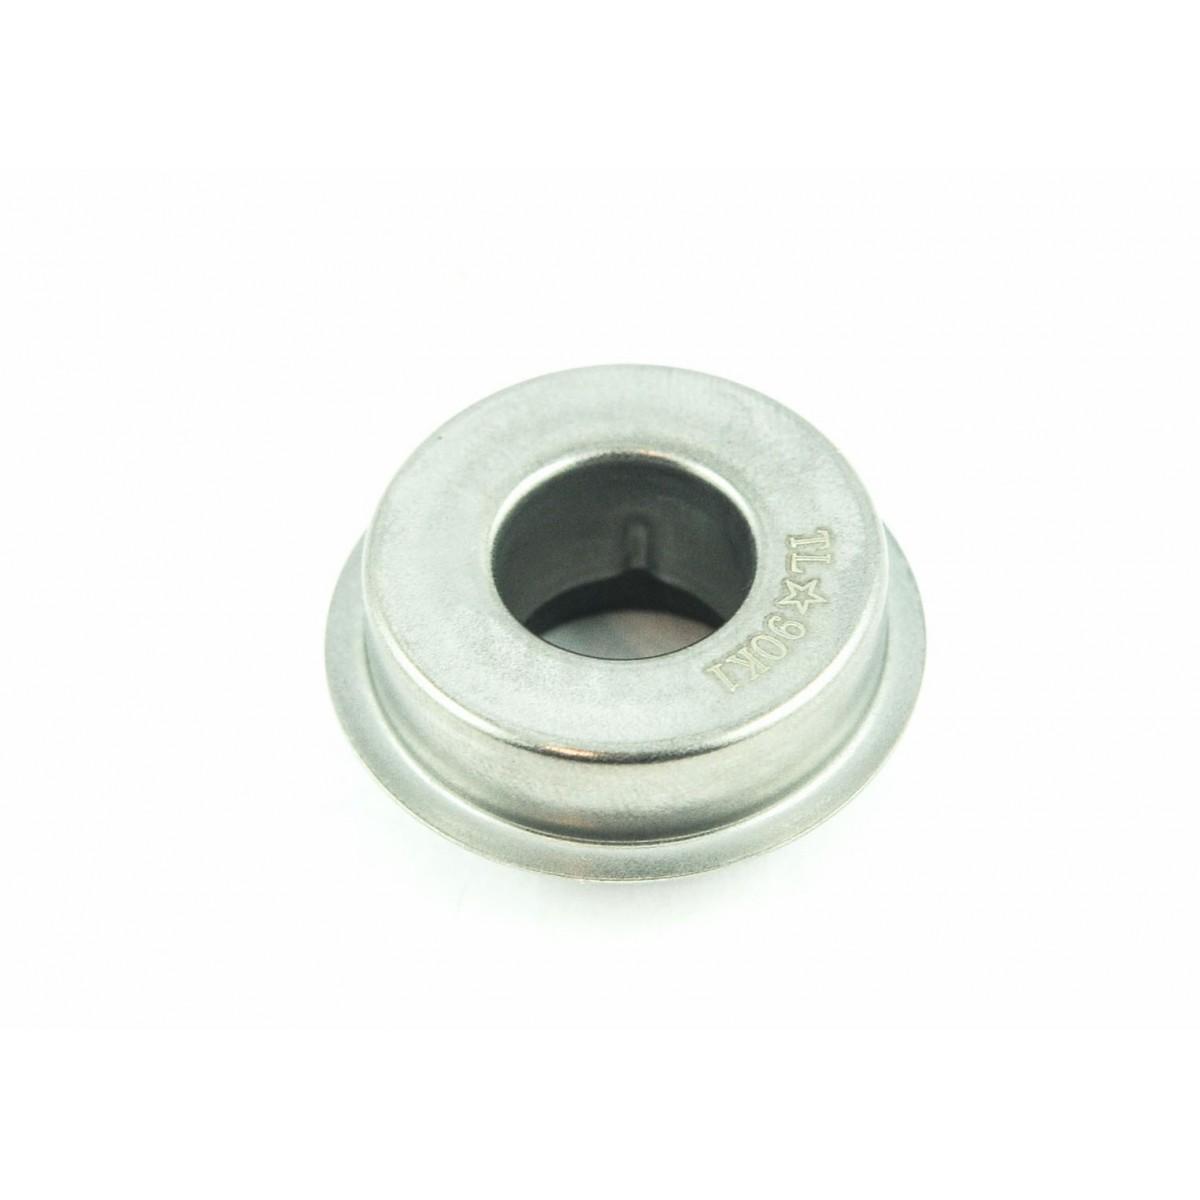 Water pump sealant HINOMOTO 30 - 15 mm.